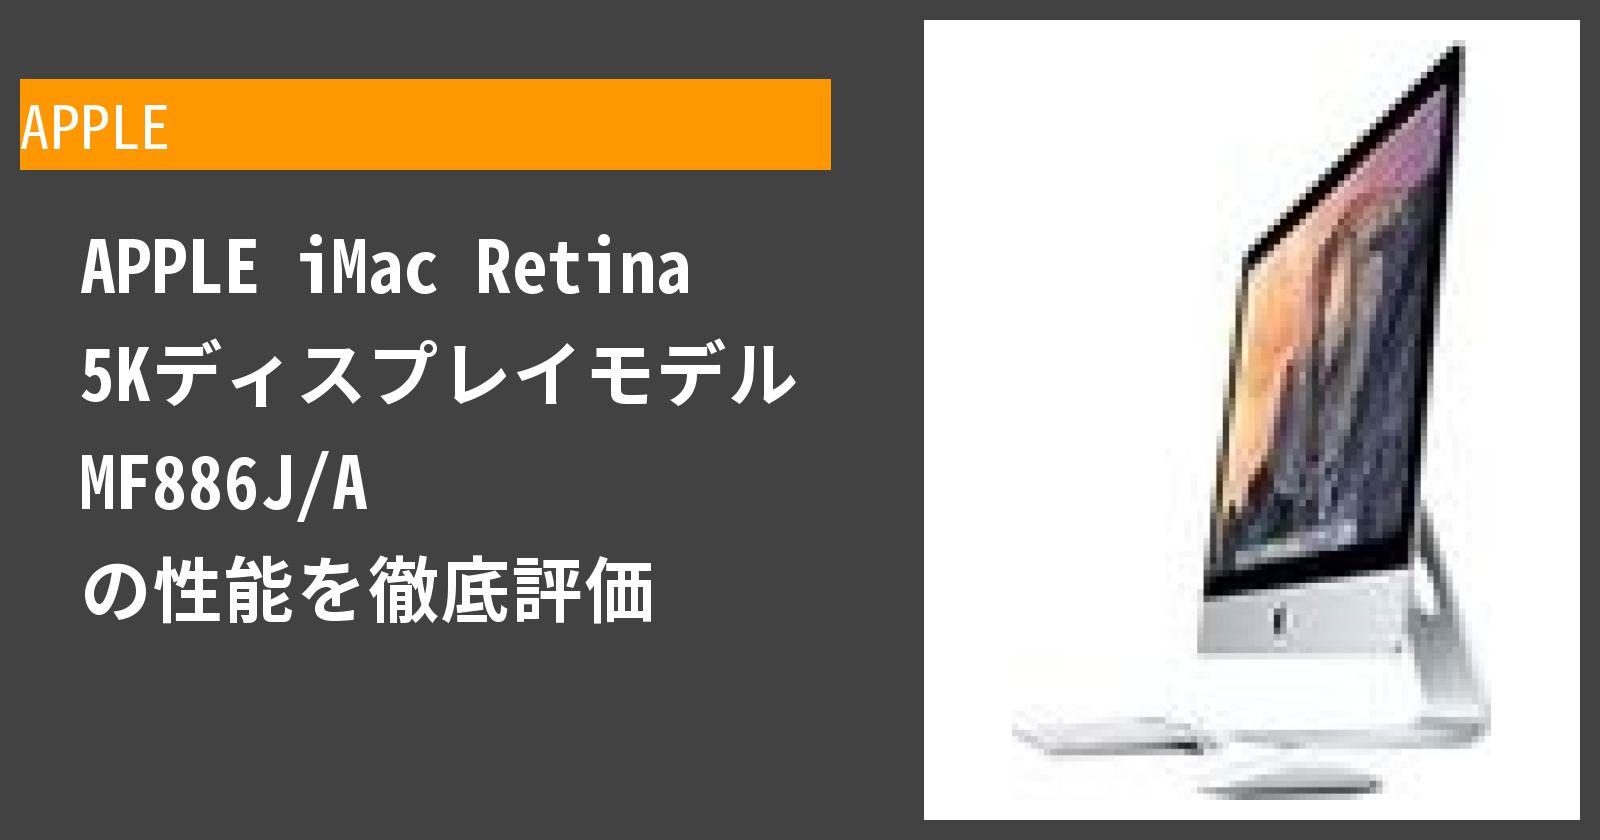 iMac Retina 5K(MF886J/A) の性能を徹底評価